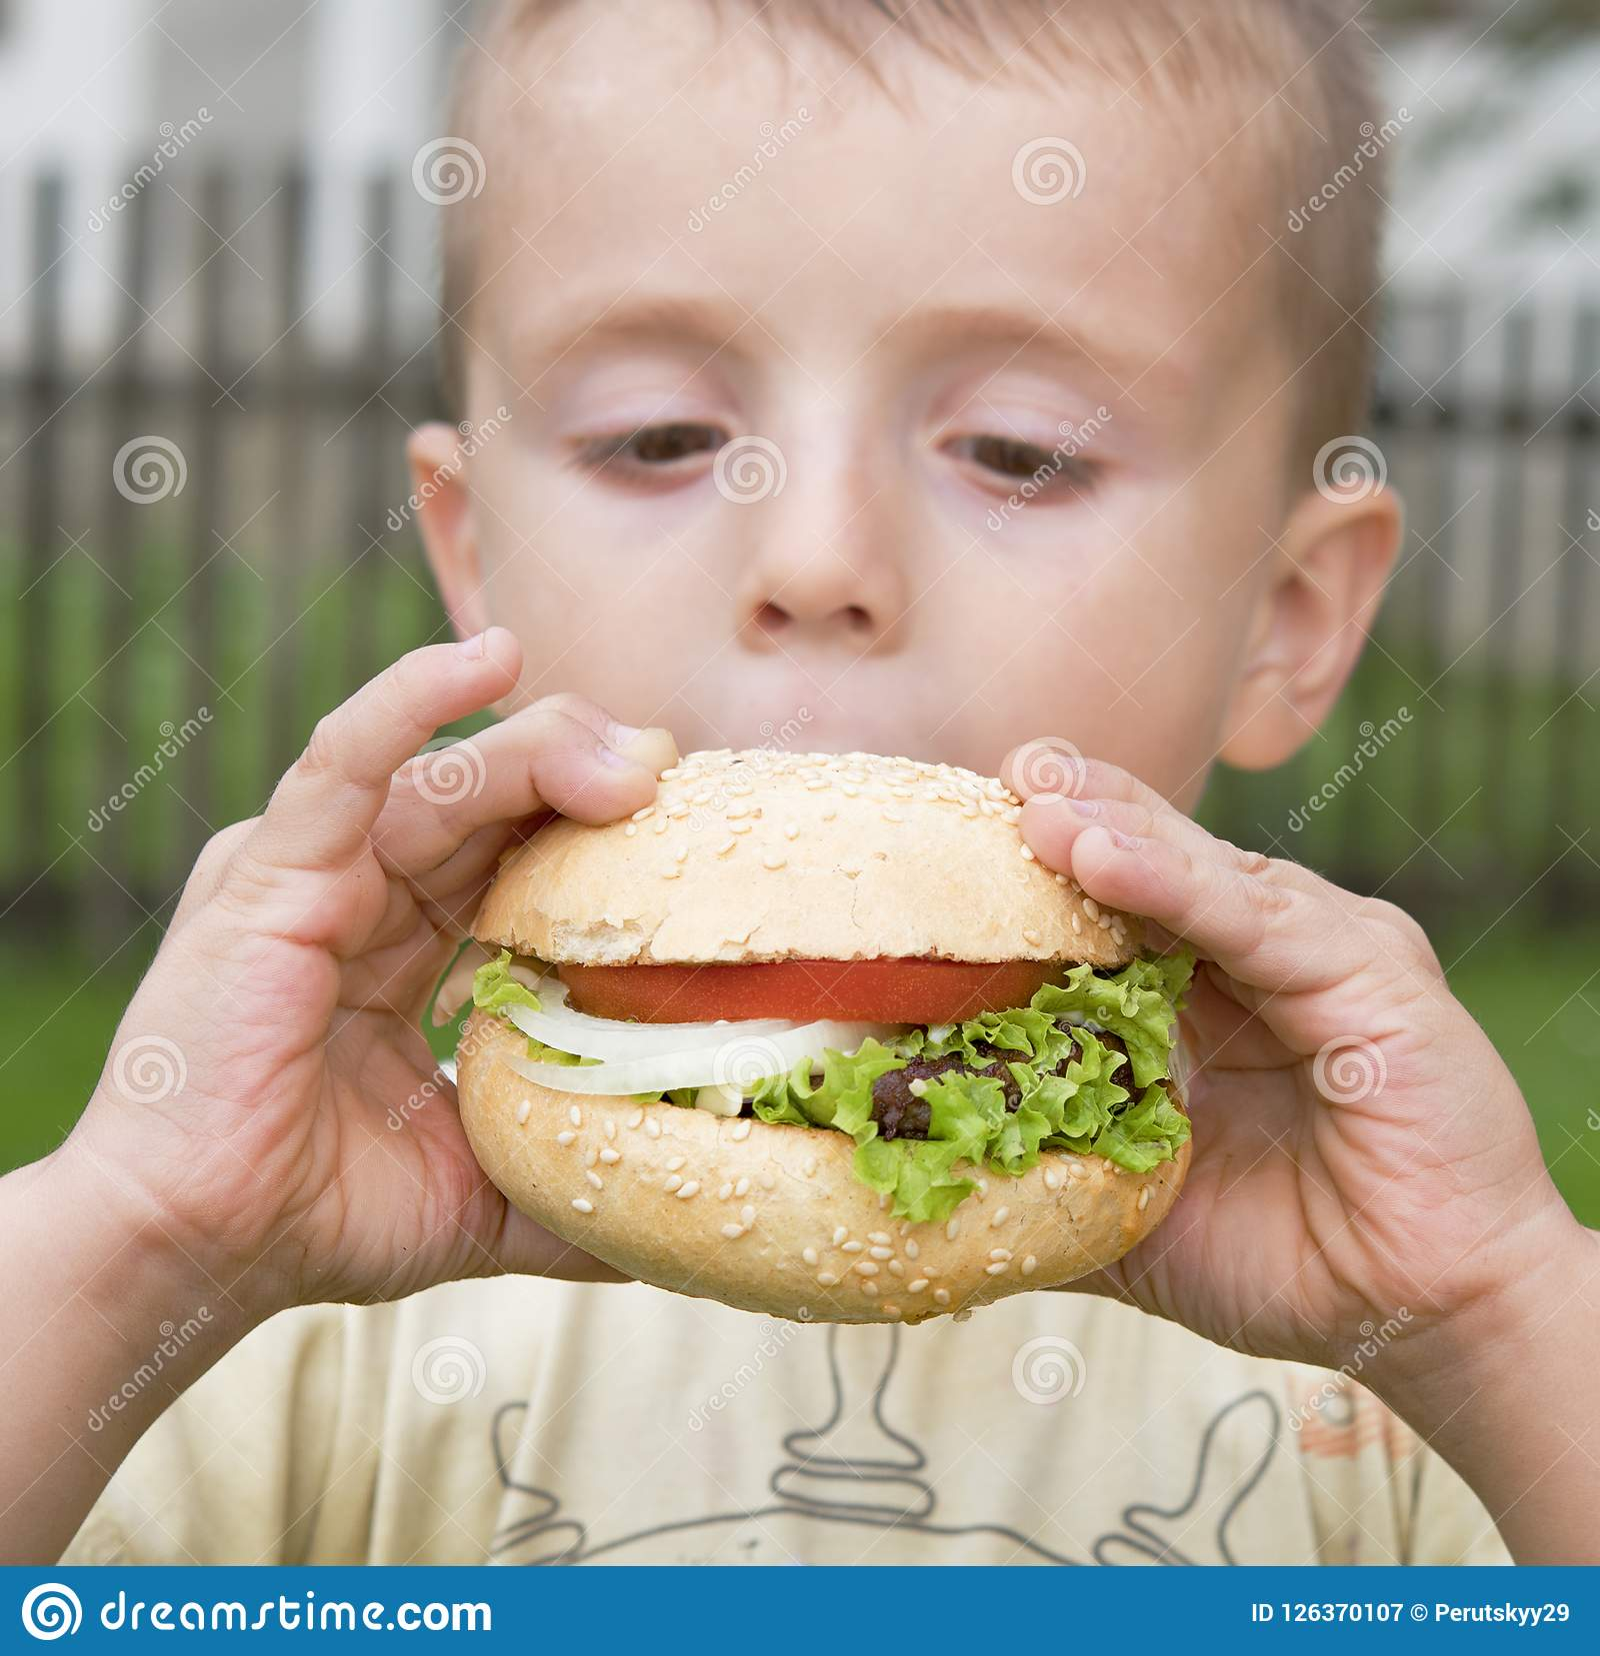 Boy eats hamburger